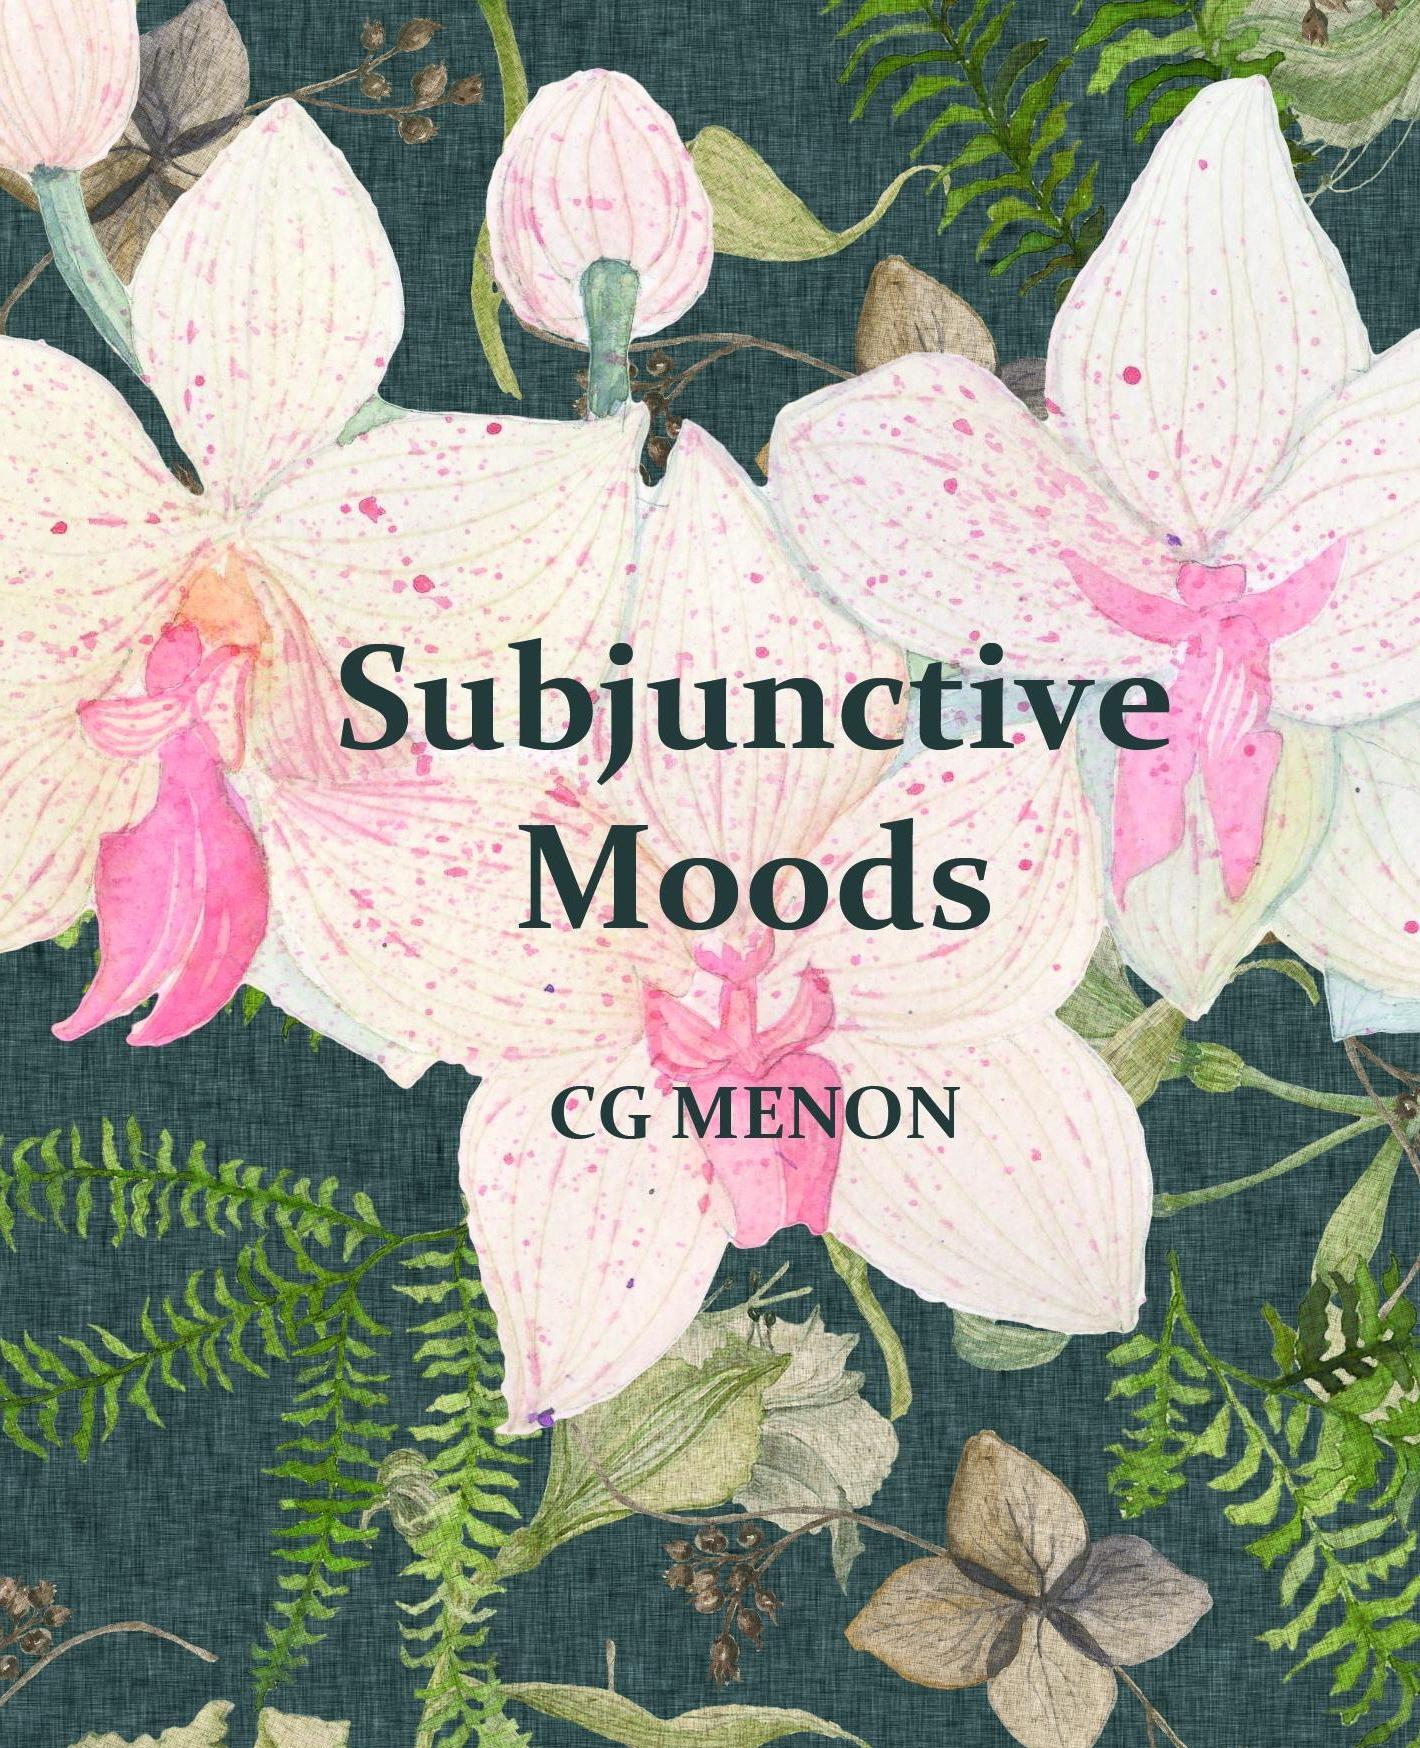 Subjunctive Moods CG Menon.jpg